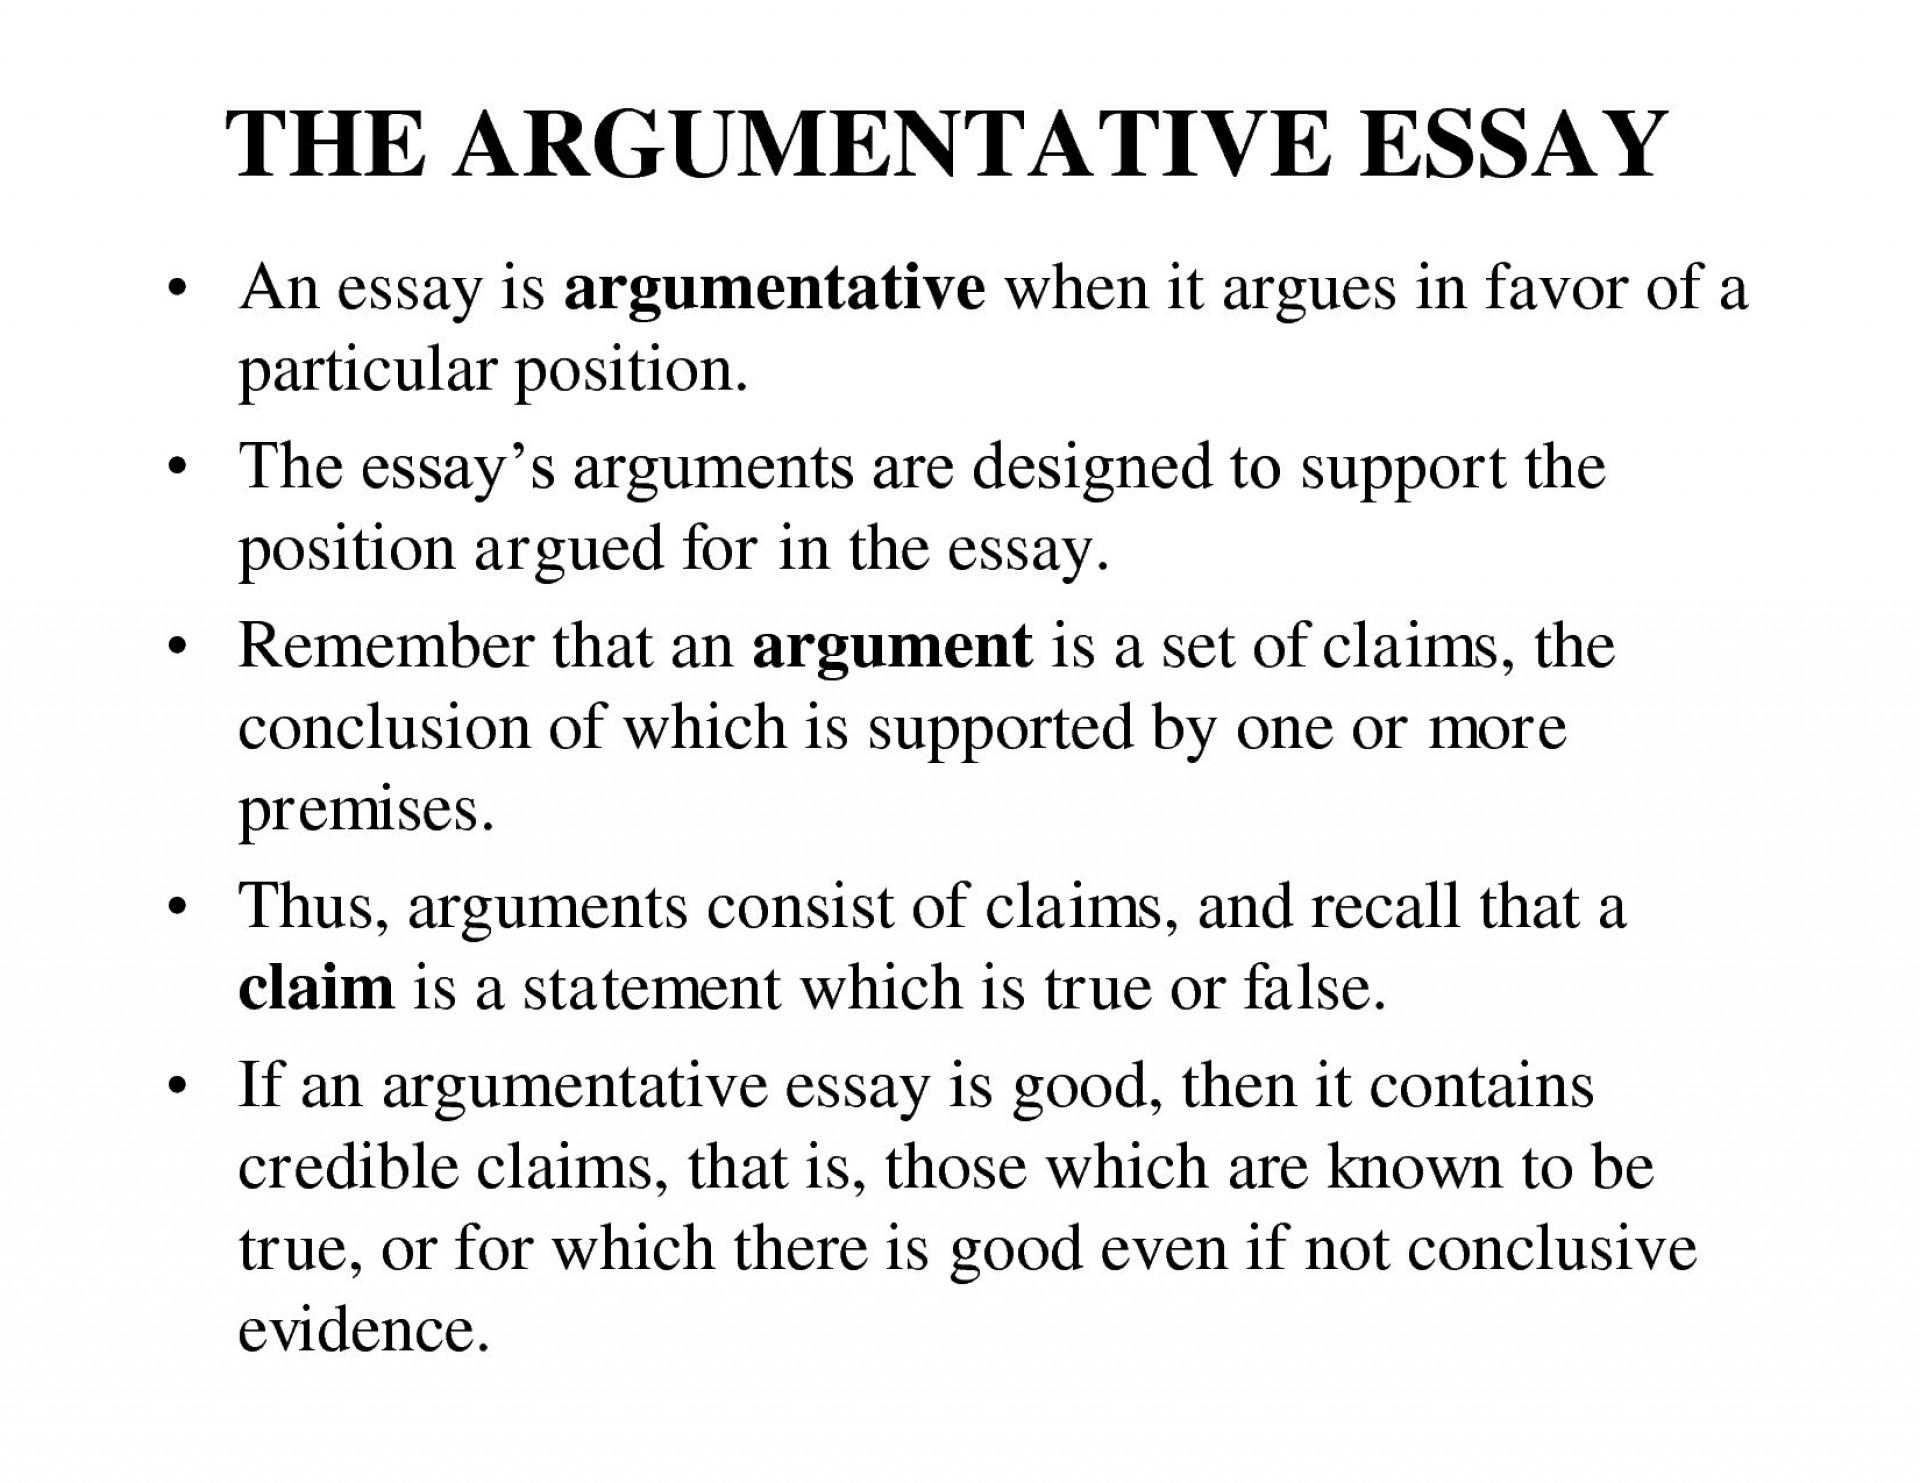 012 Conclusion Paragraphes For Argumentative Essay How To Write Good An Analysis World Ofe Throu Informative Sentence Opinion Art Academic Wondrous A Paragraph 1920